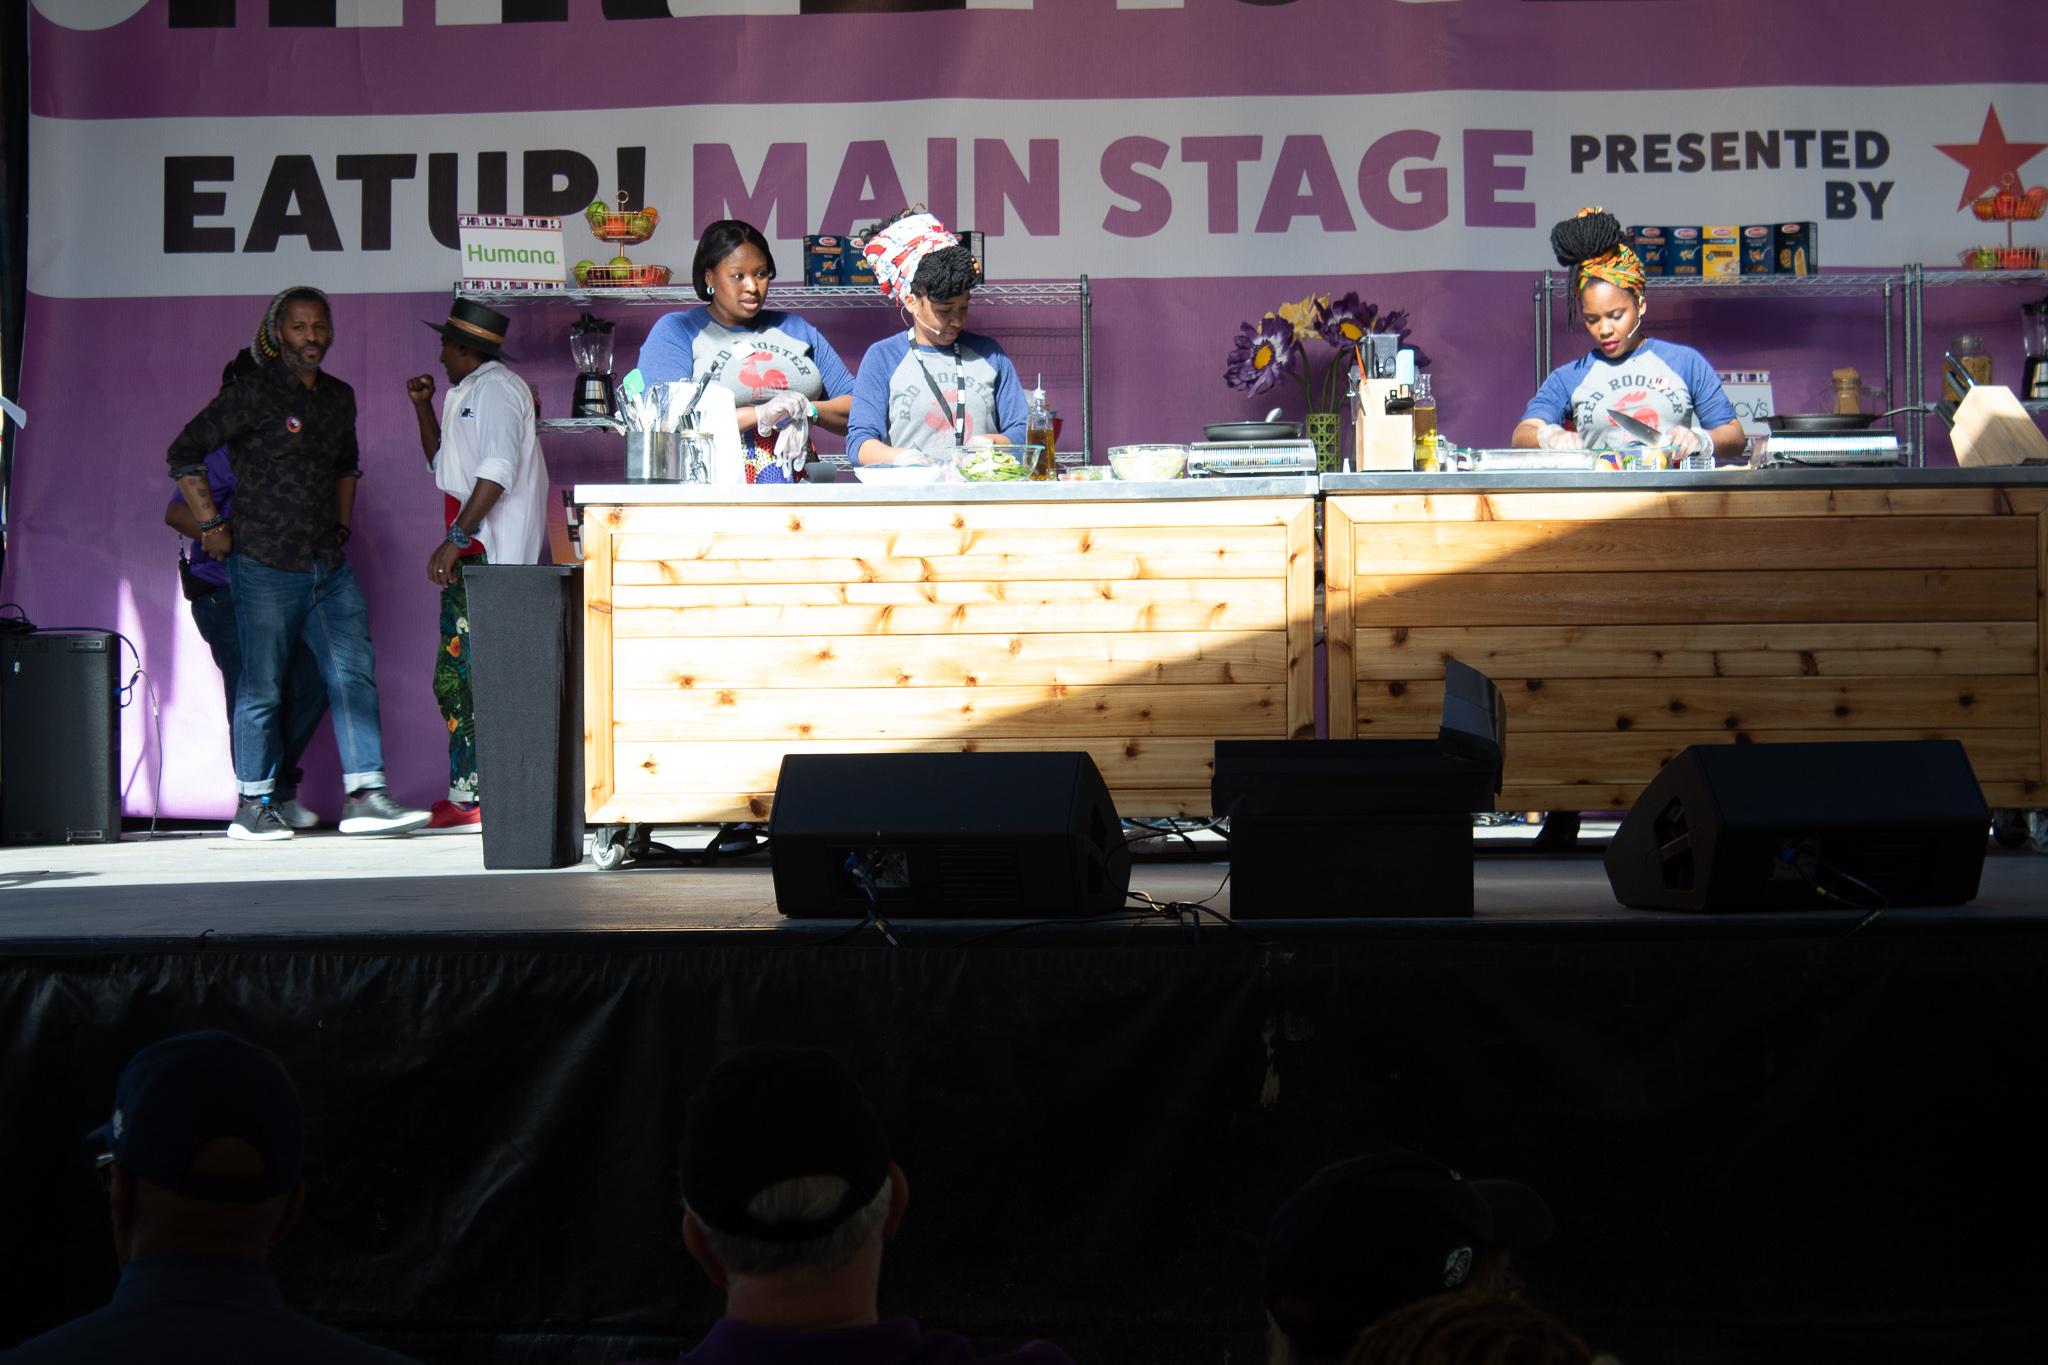 Harlem EatUp Main Stage